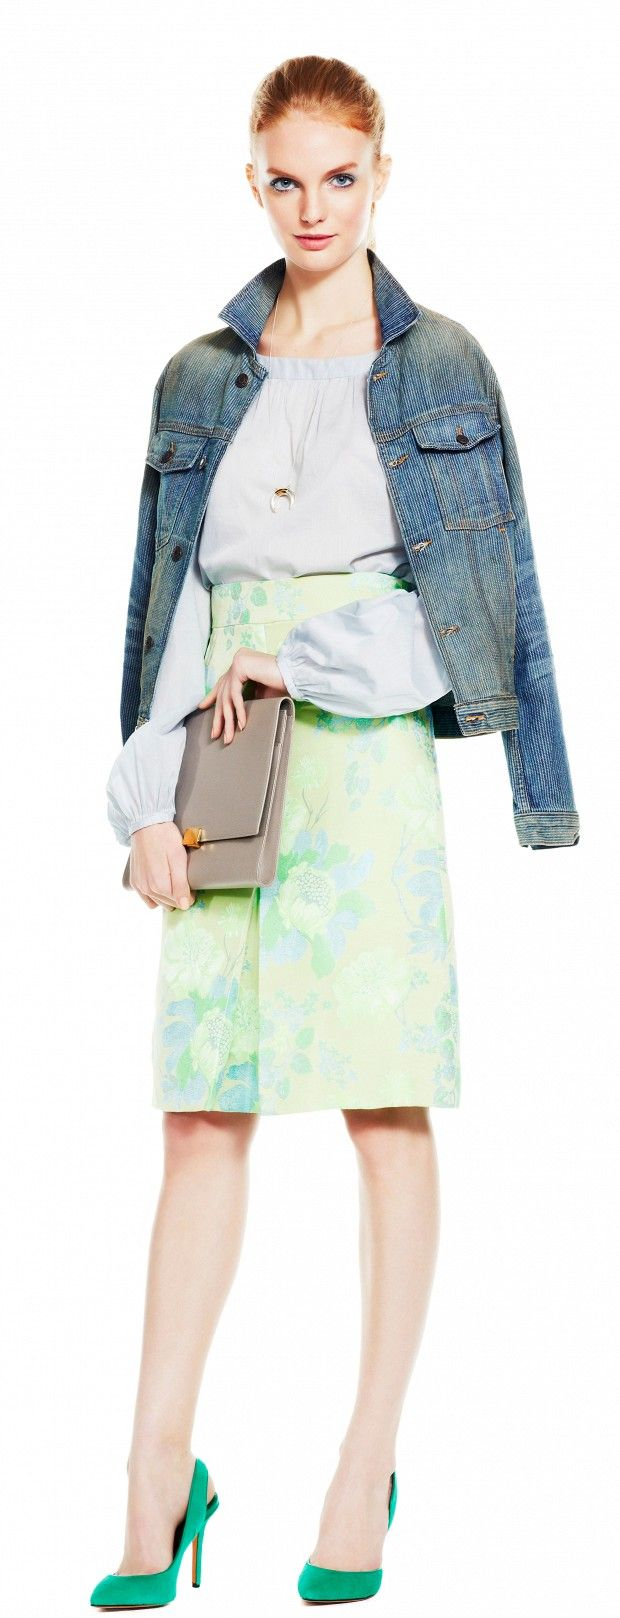 Green dress denim jacket  Mint Condition ombre mint skirt light blue blouse denim jacket